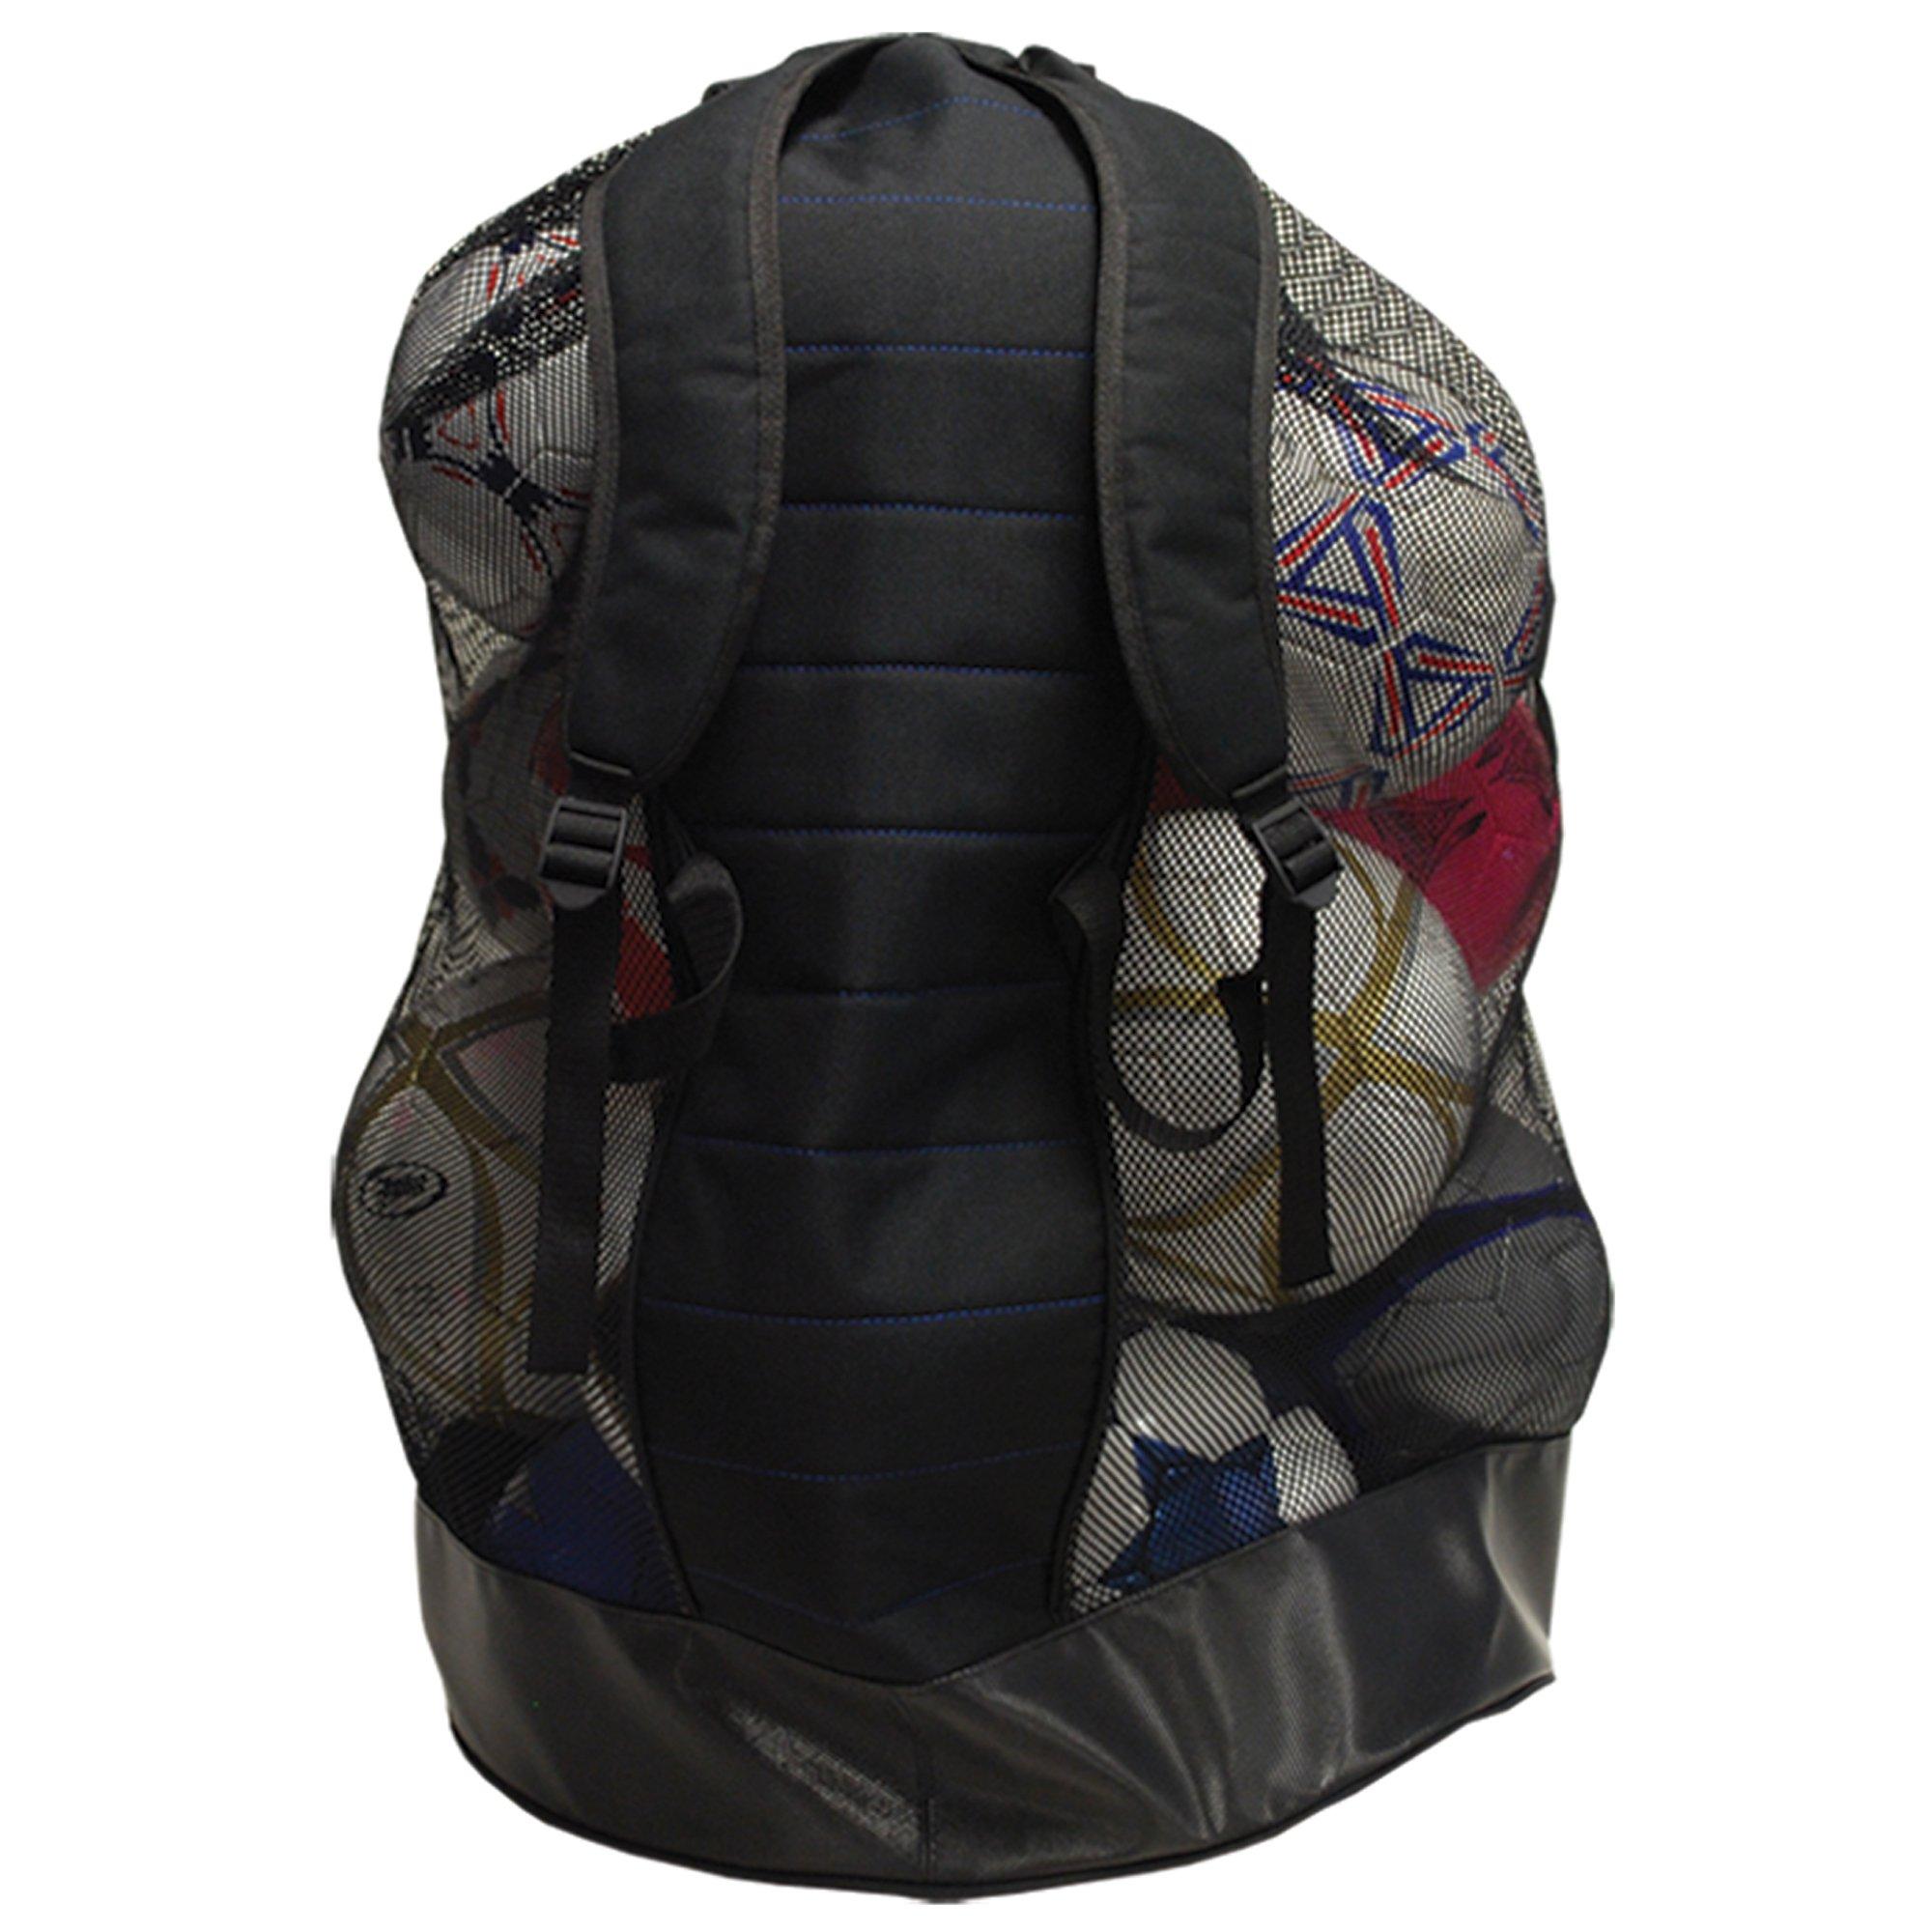 AGORA Heavy-Duty Soccer Ball Carrier Bag (12-15 Balls), Black by AGORA (Image #2)